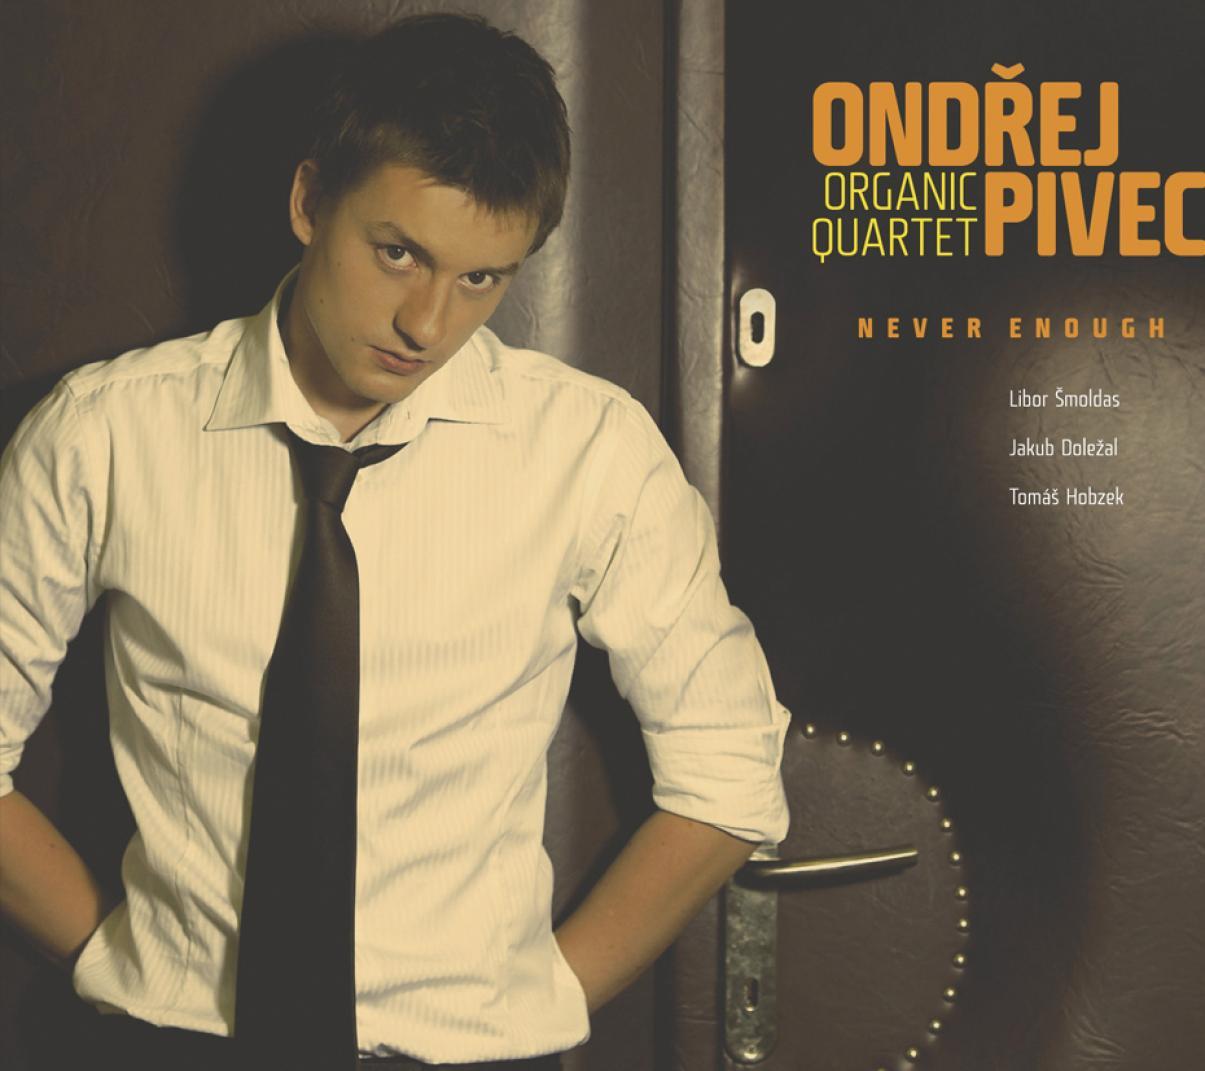 Ondřej Pivec & Organic Quartet: Never Enough